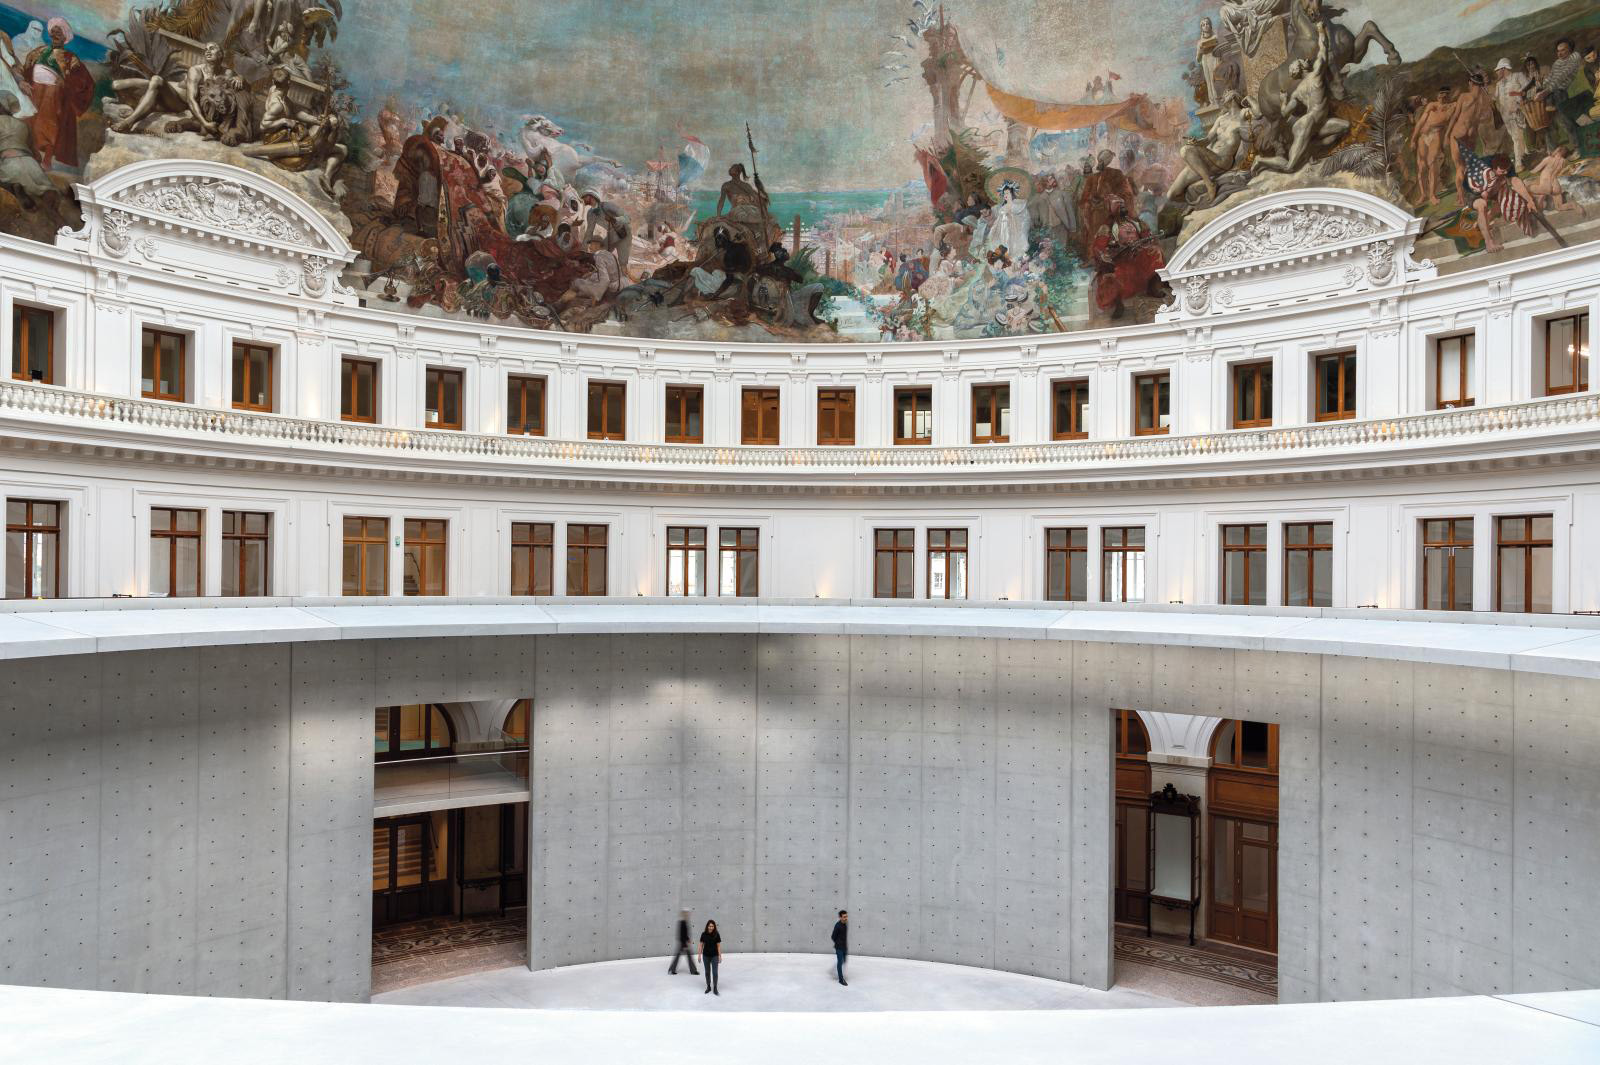 Bourse de Commerce - Pinault CollectionTadao Ando Architect & Associates, Niney & Marca Architectes, Agence Pierre-Antoine Gatier. Photo: